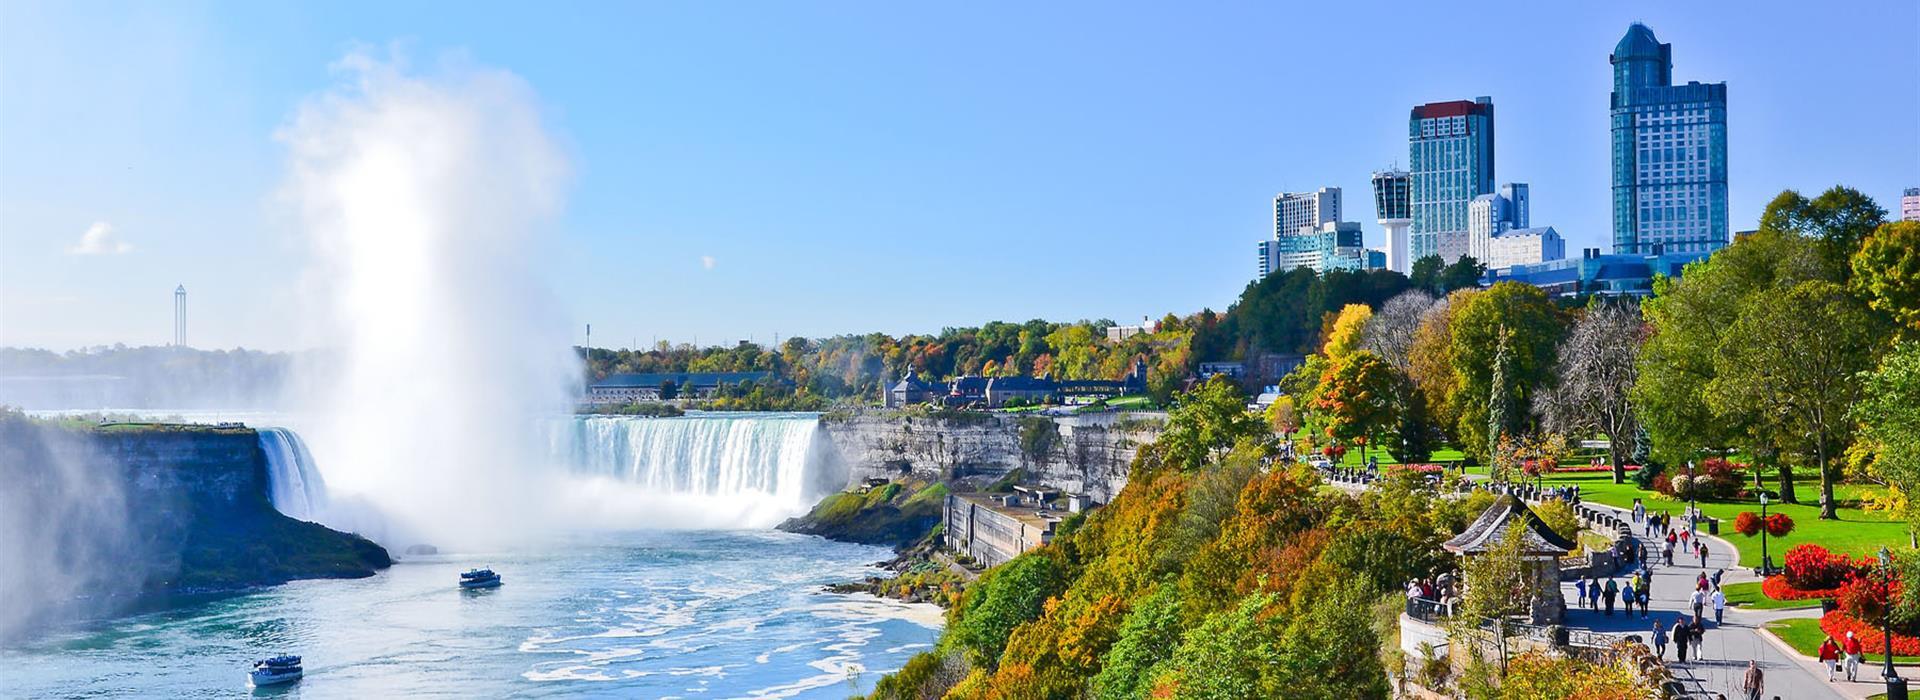 Usa-Niagara-Falls_349625687